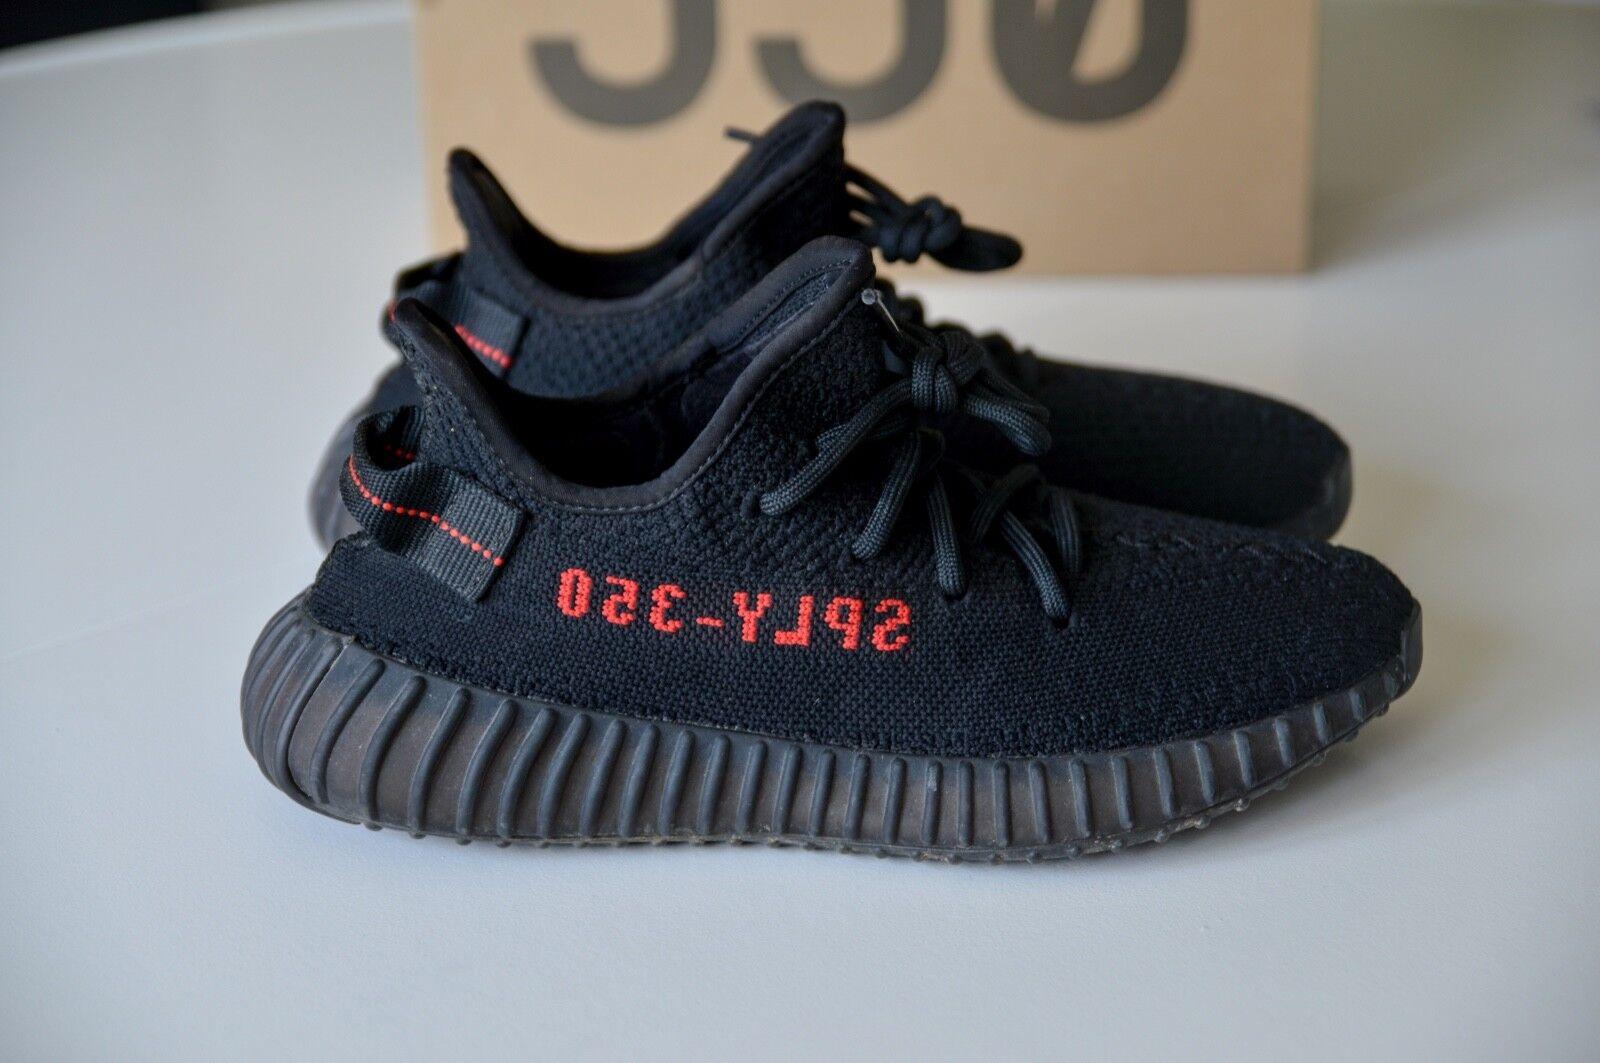 Adidas Yeezy Boost 350 V2 nero rosso Brosso Brosso Brosso US 6 FR 38 2 3 CP9652 | Arte Squisita  | Sig/Sig Ra Scarpa  0595c6